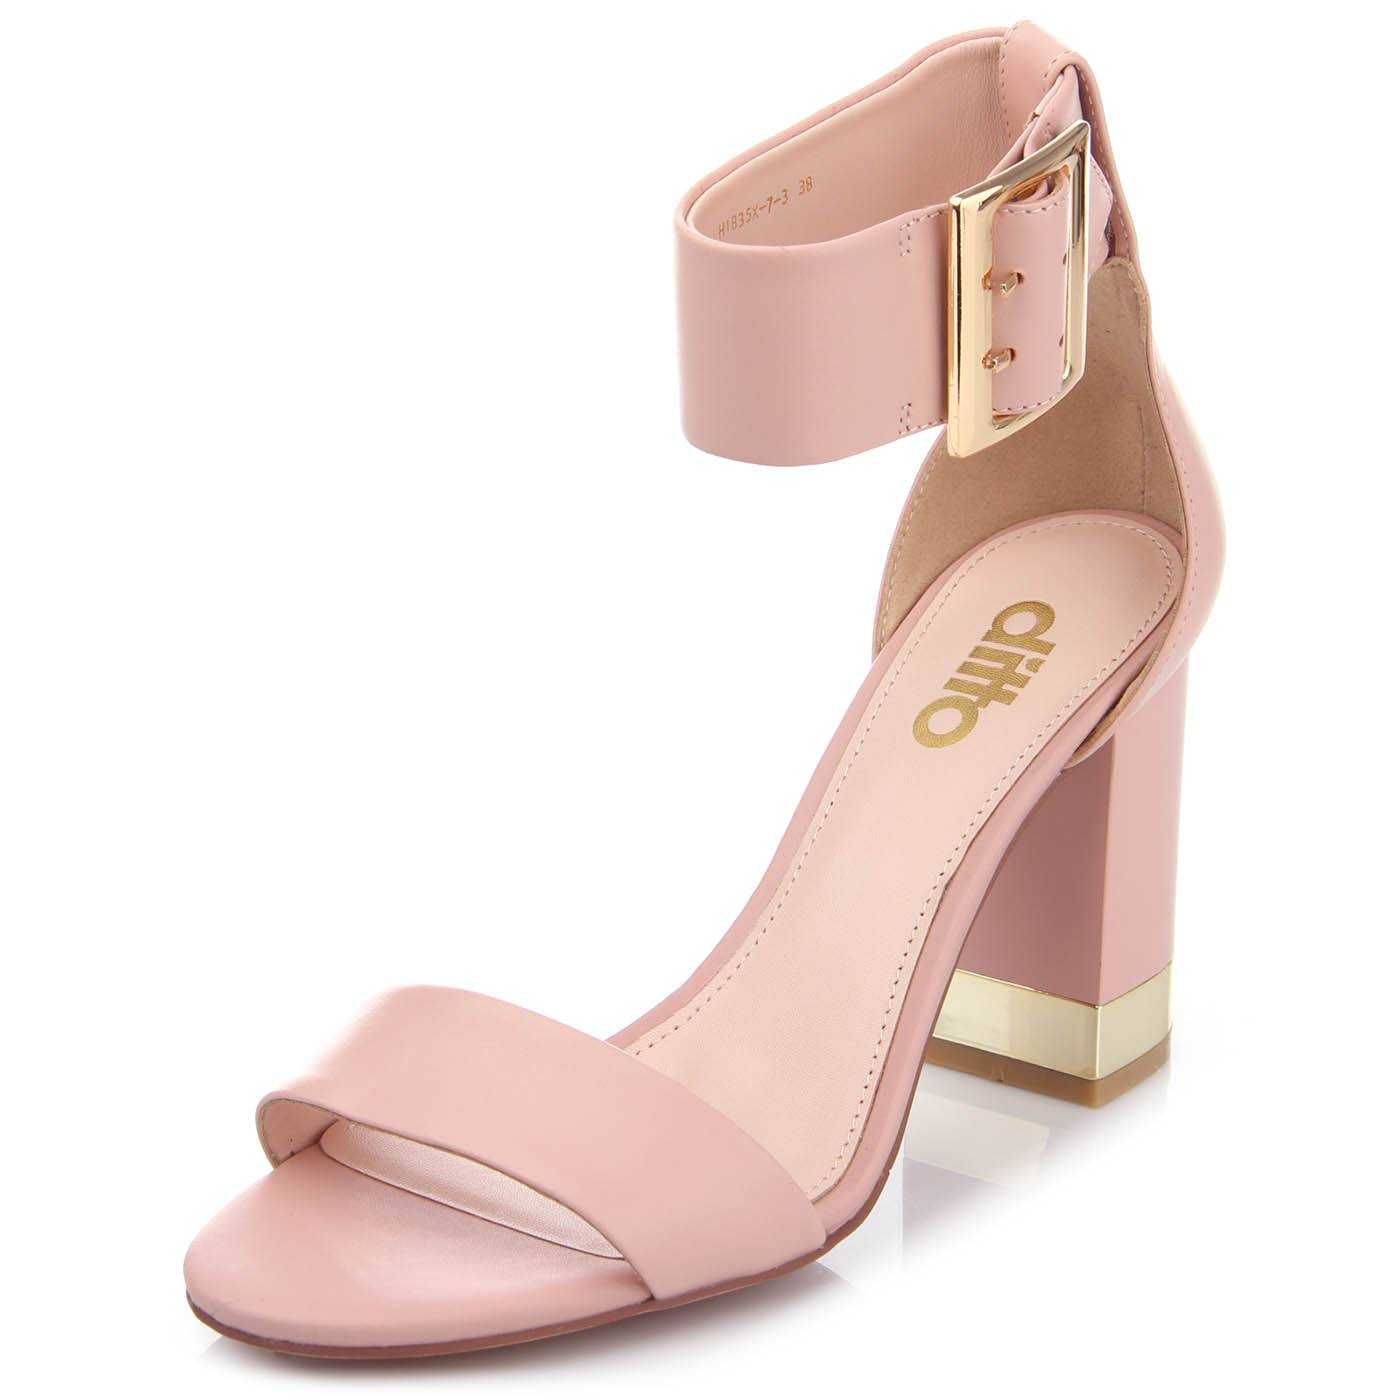 Босоніжки жіночі ditto 6752 Рожевий купить по выгодной цене в ... 72653c16f988b